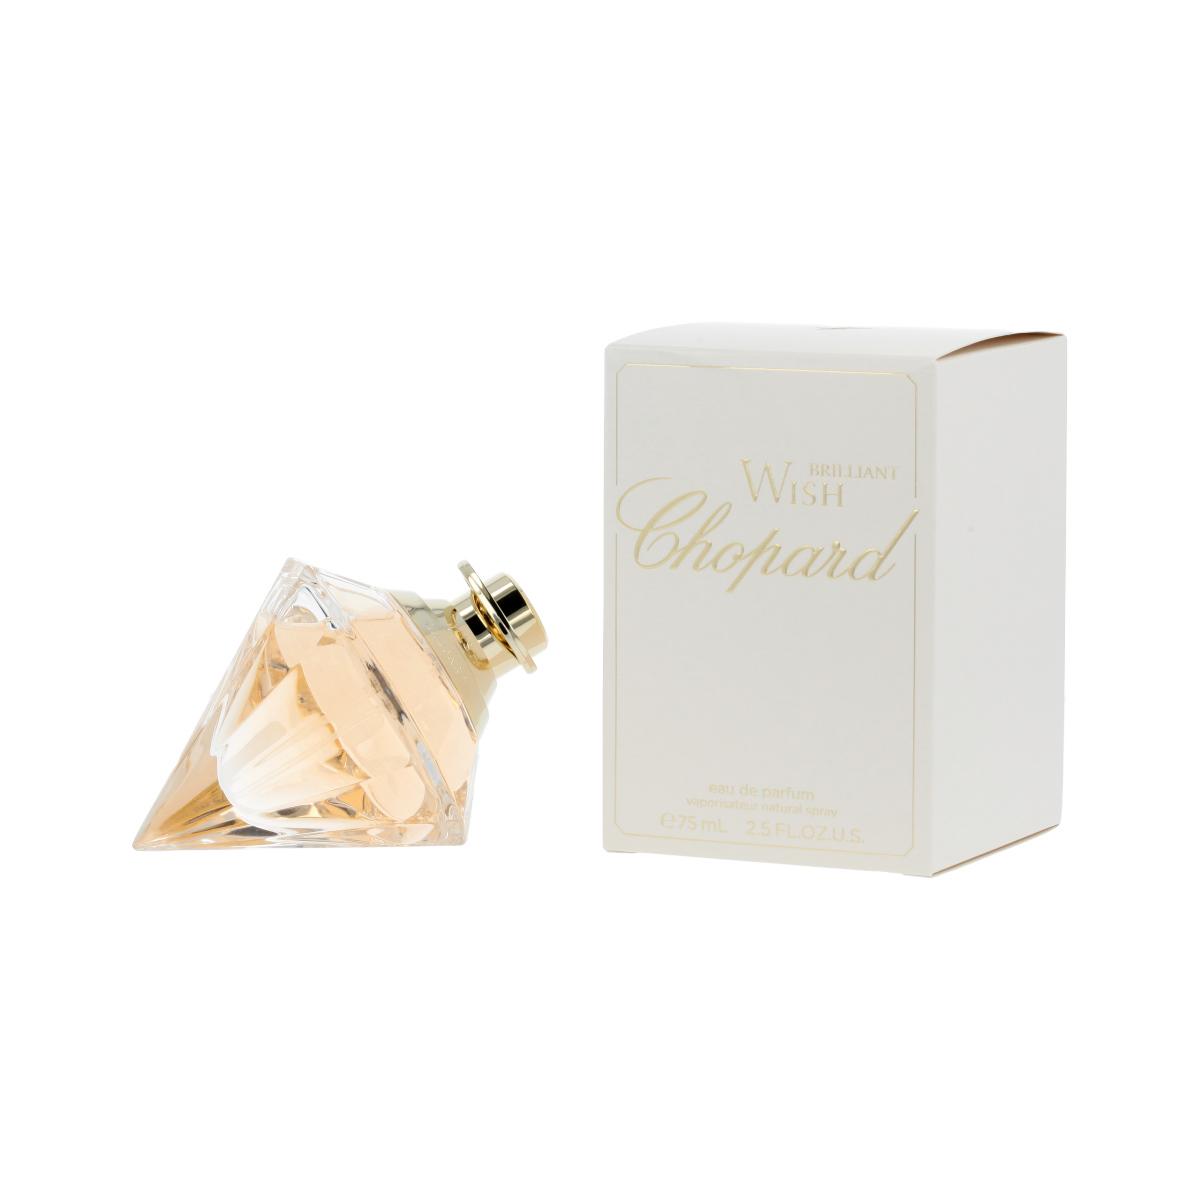 Chopard Brilliant Wish Eau De Parfum 75 ml (woman) 12919